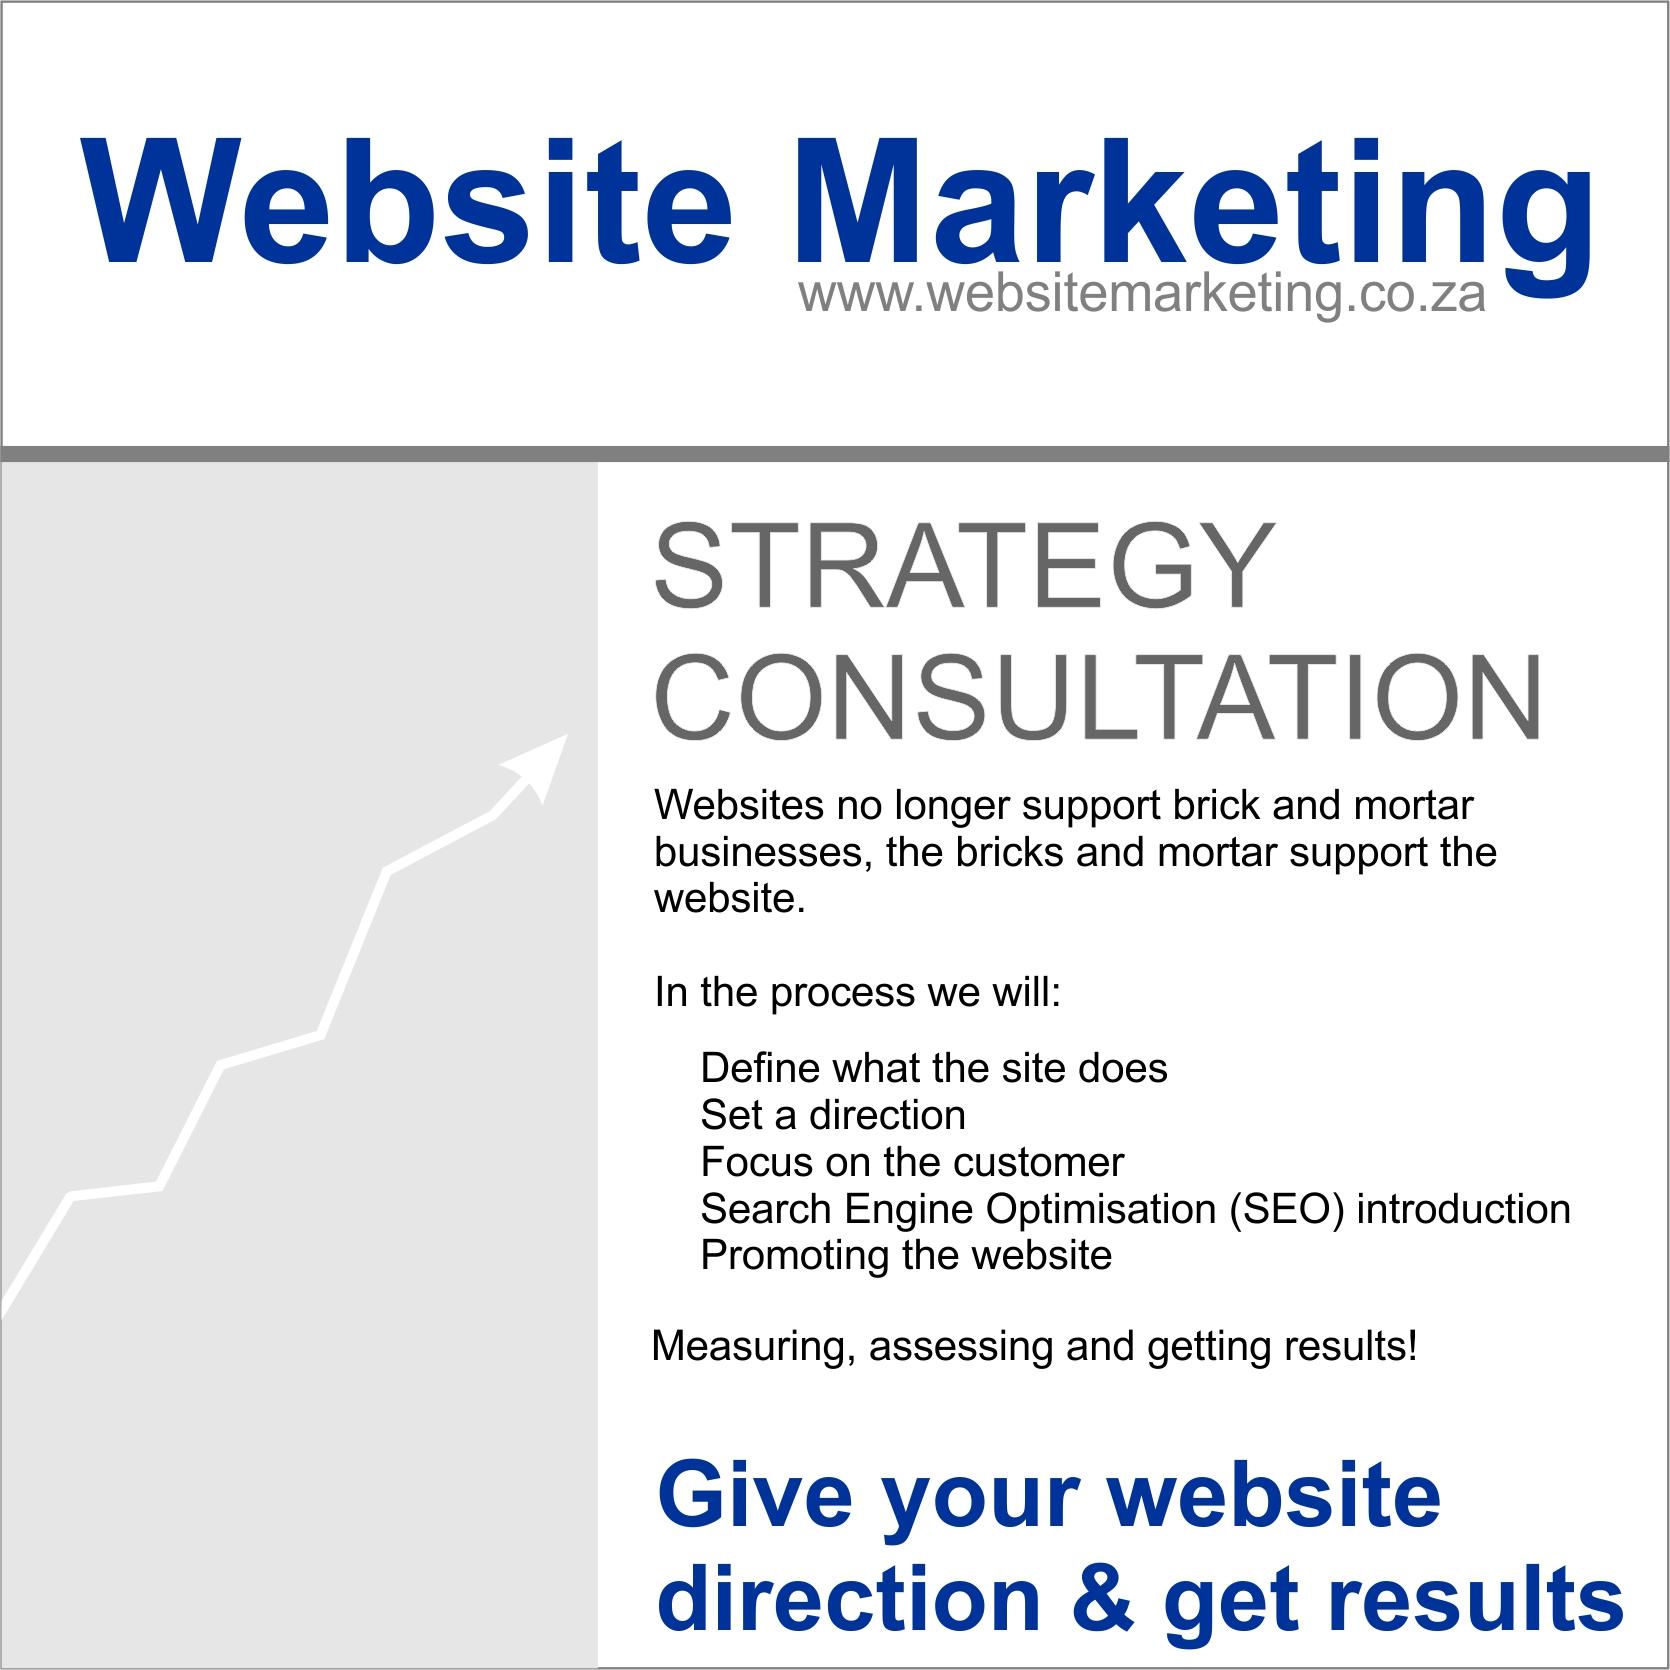 Website Marketing Strategy Consultation